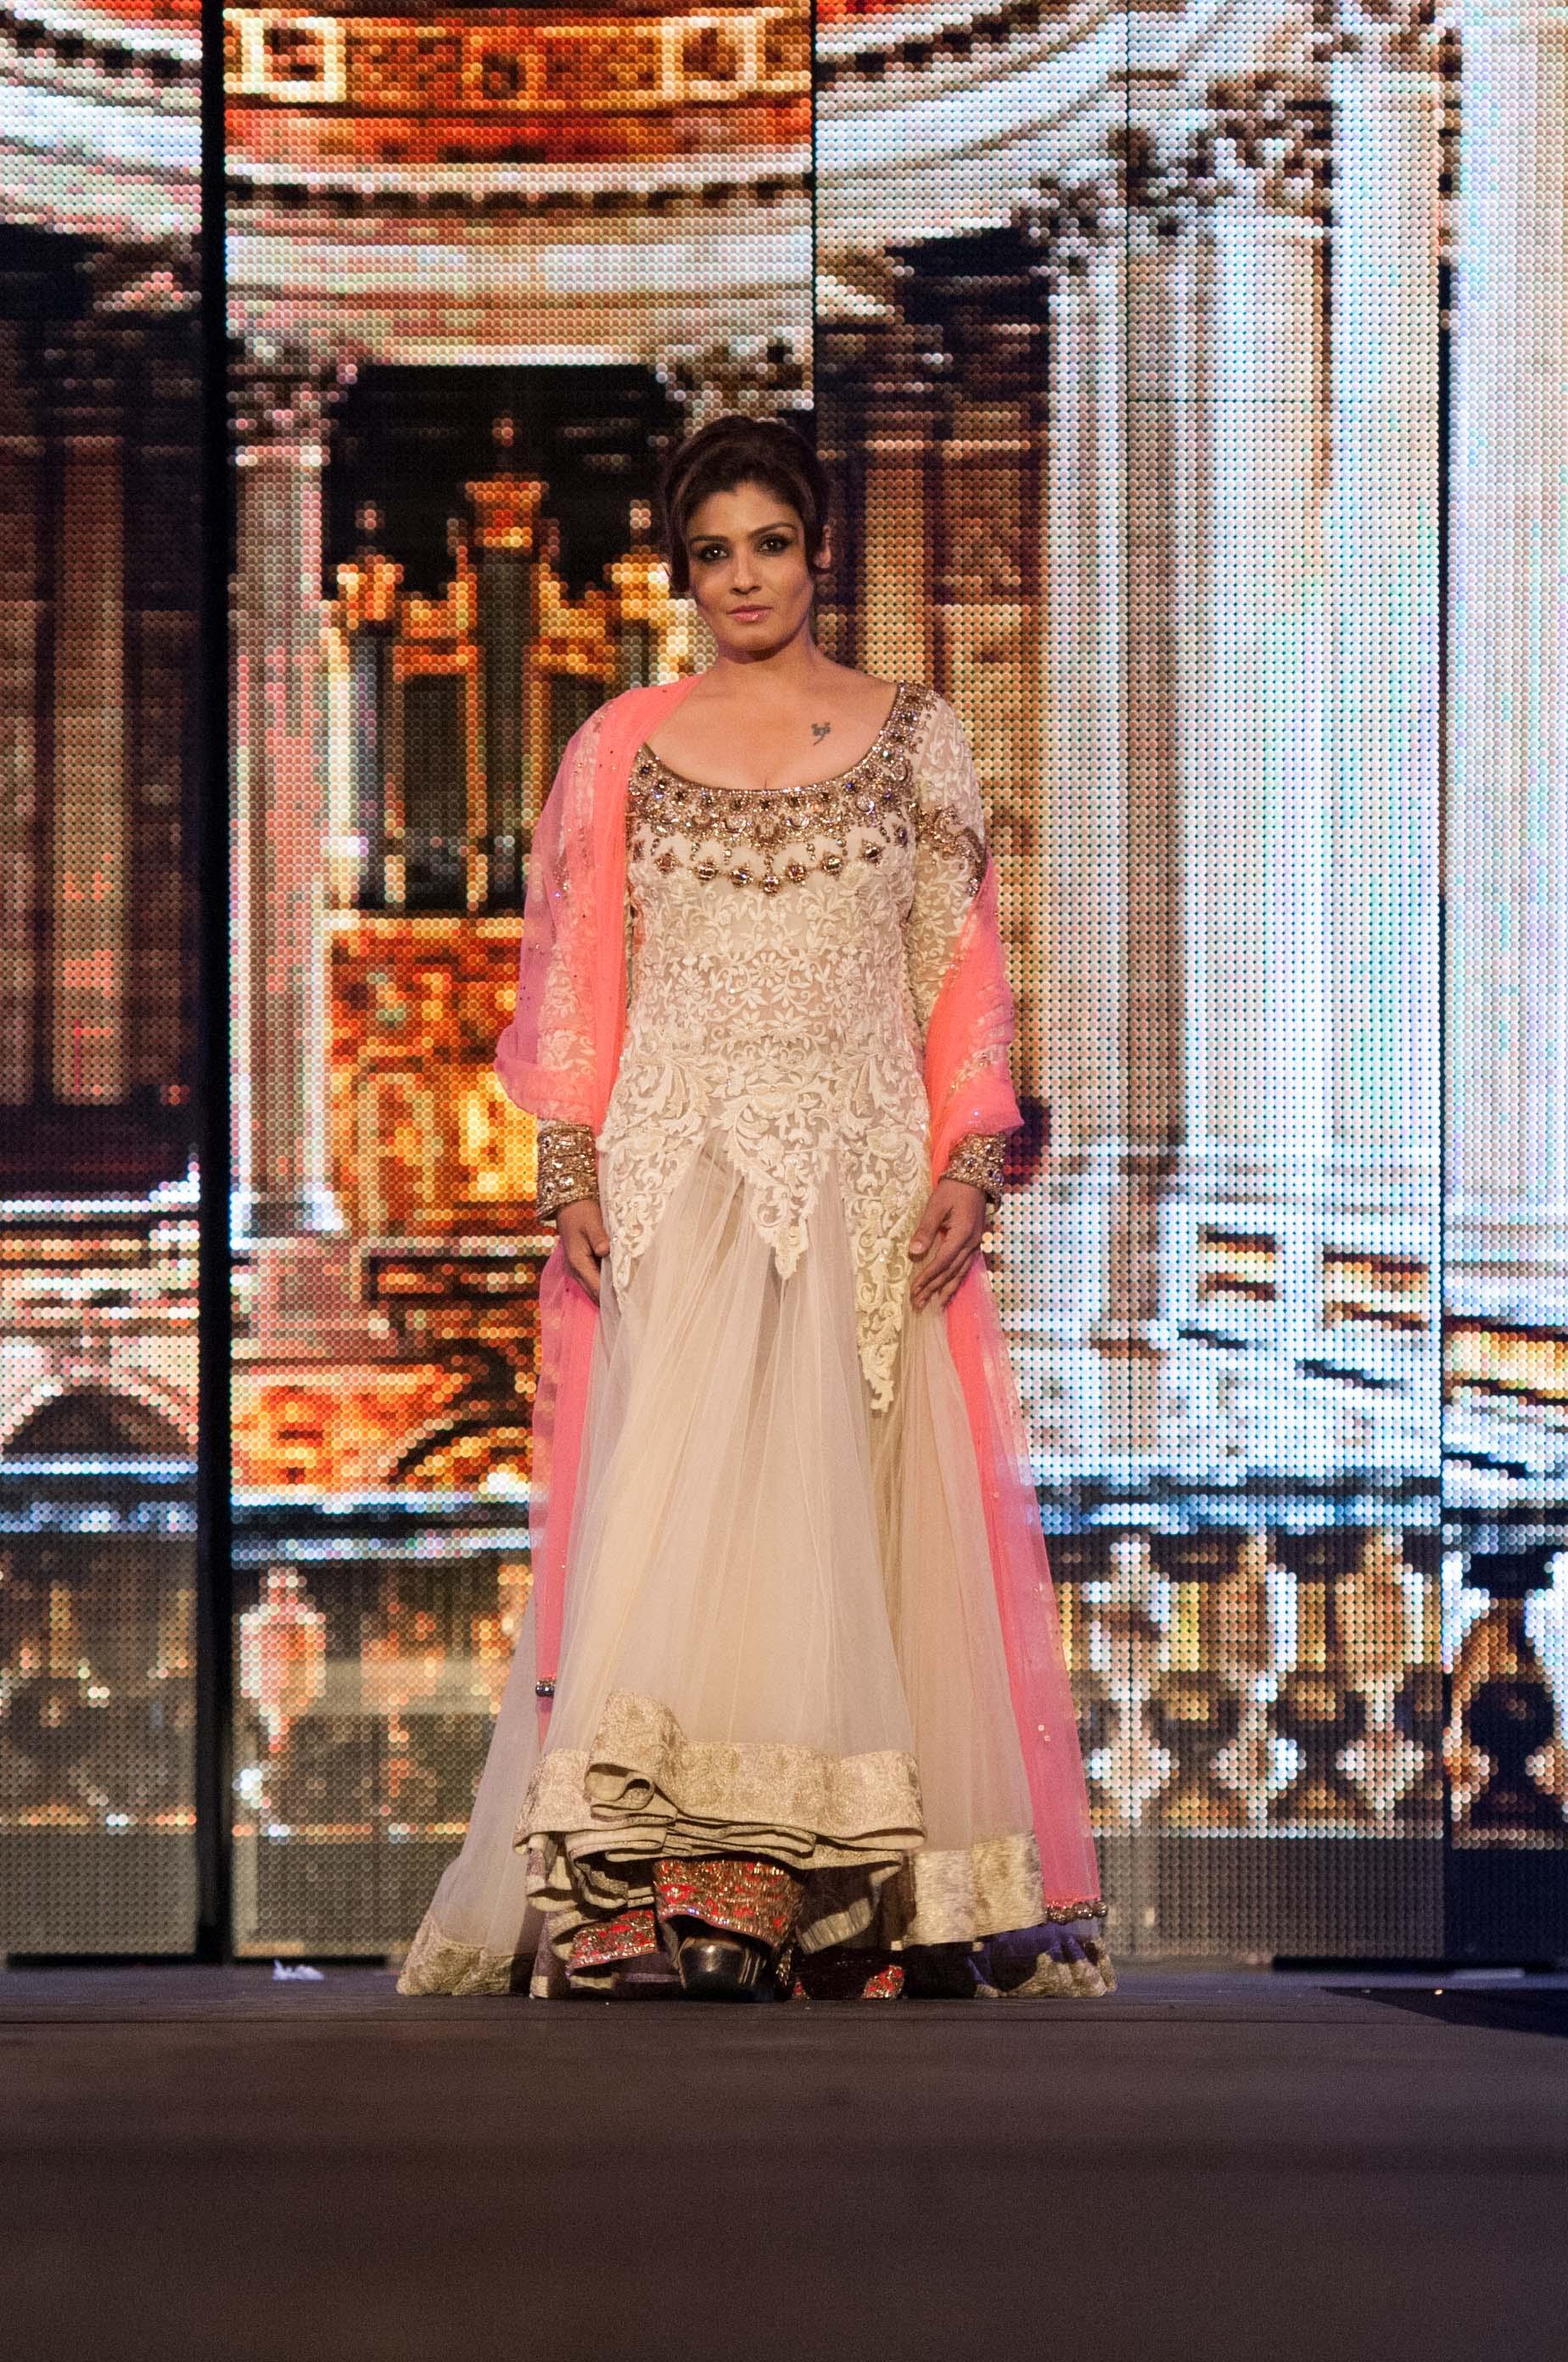 Raveena Tandon Walks For Manish Malhotra